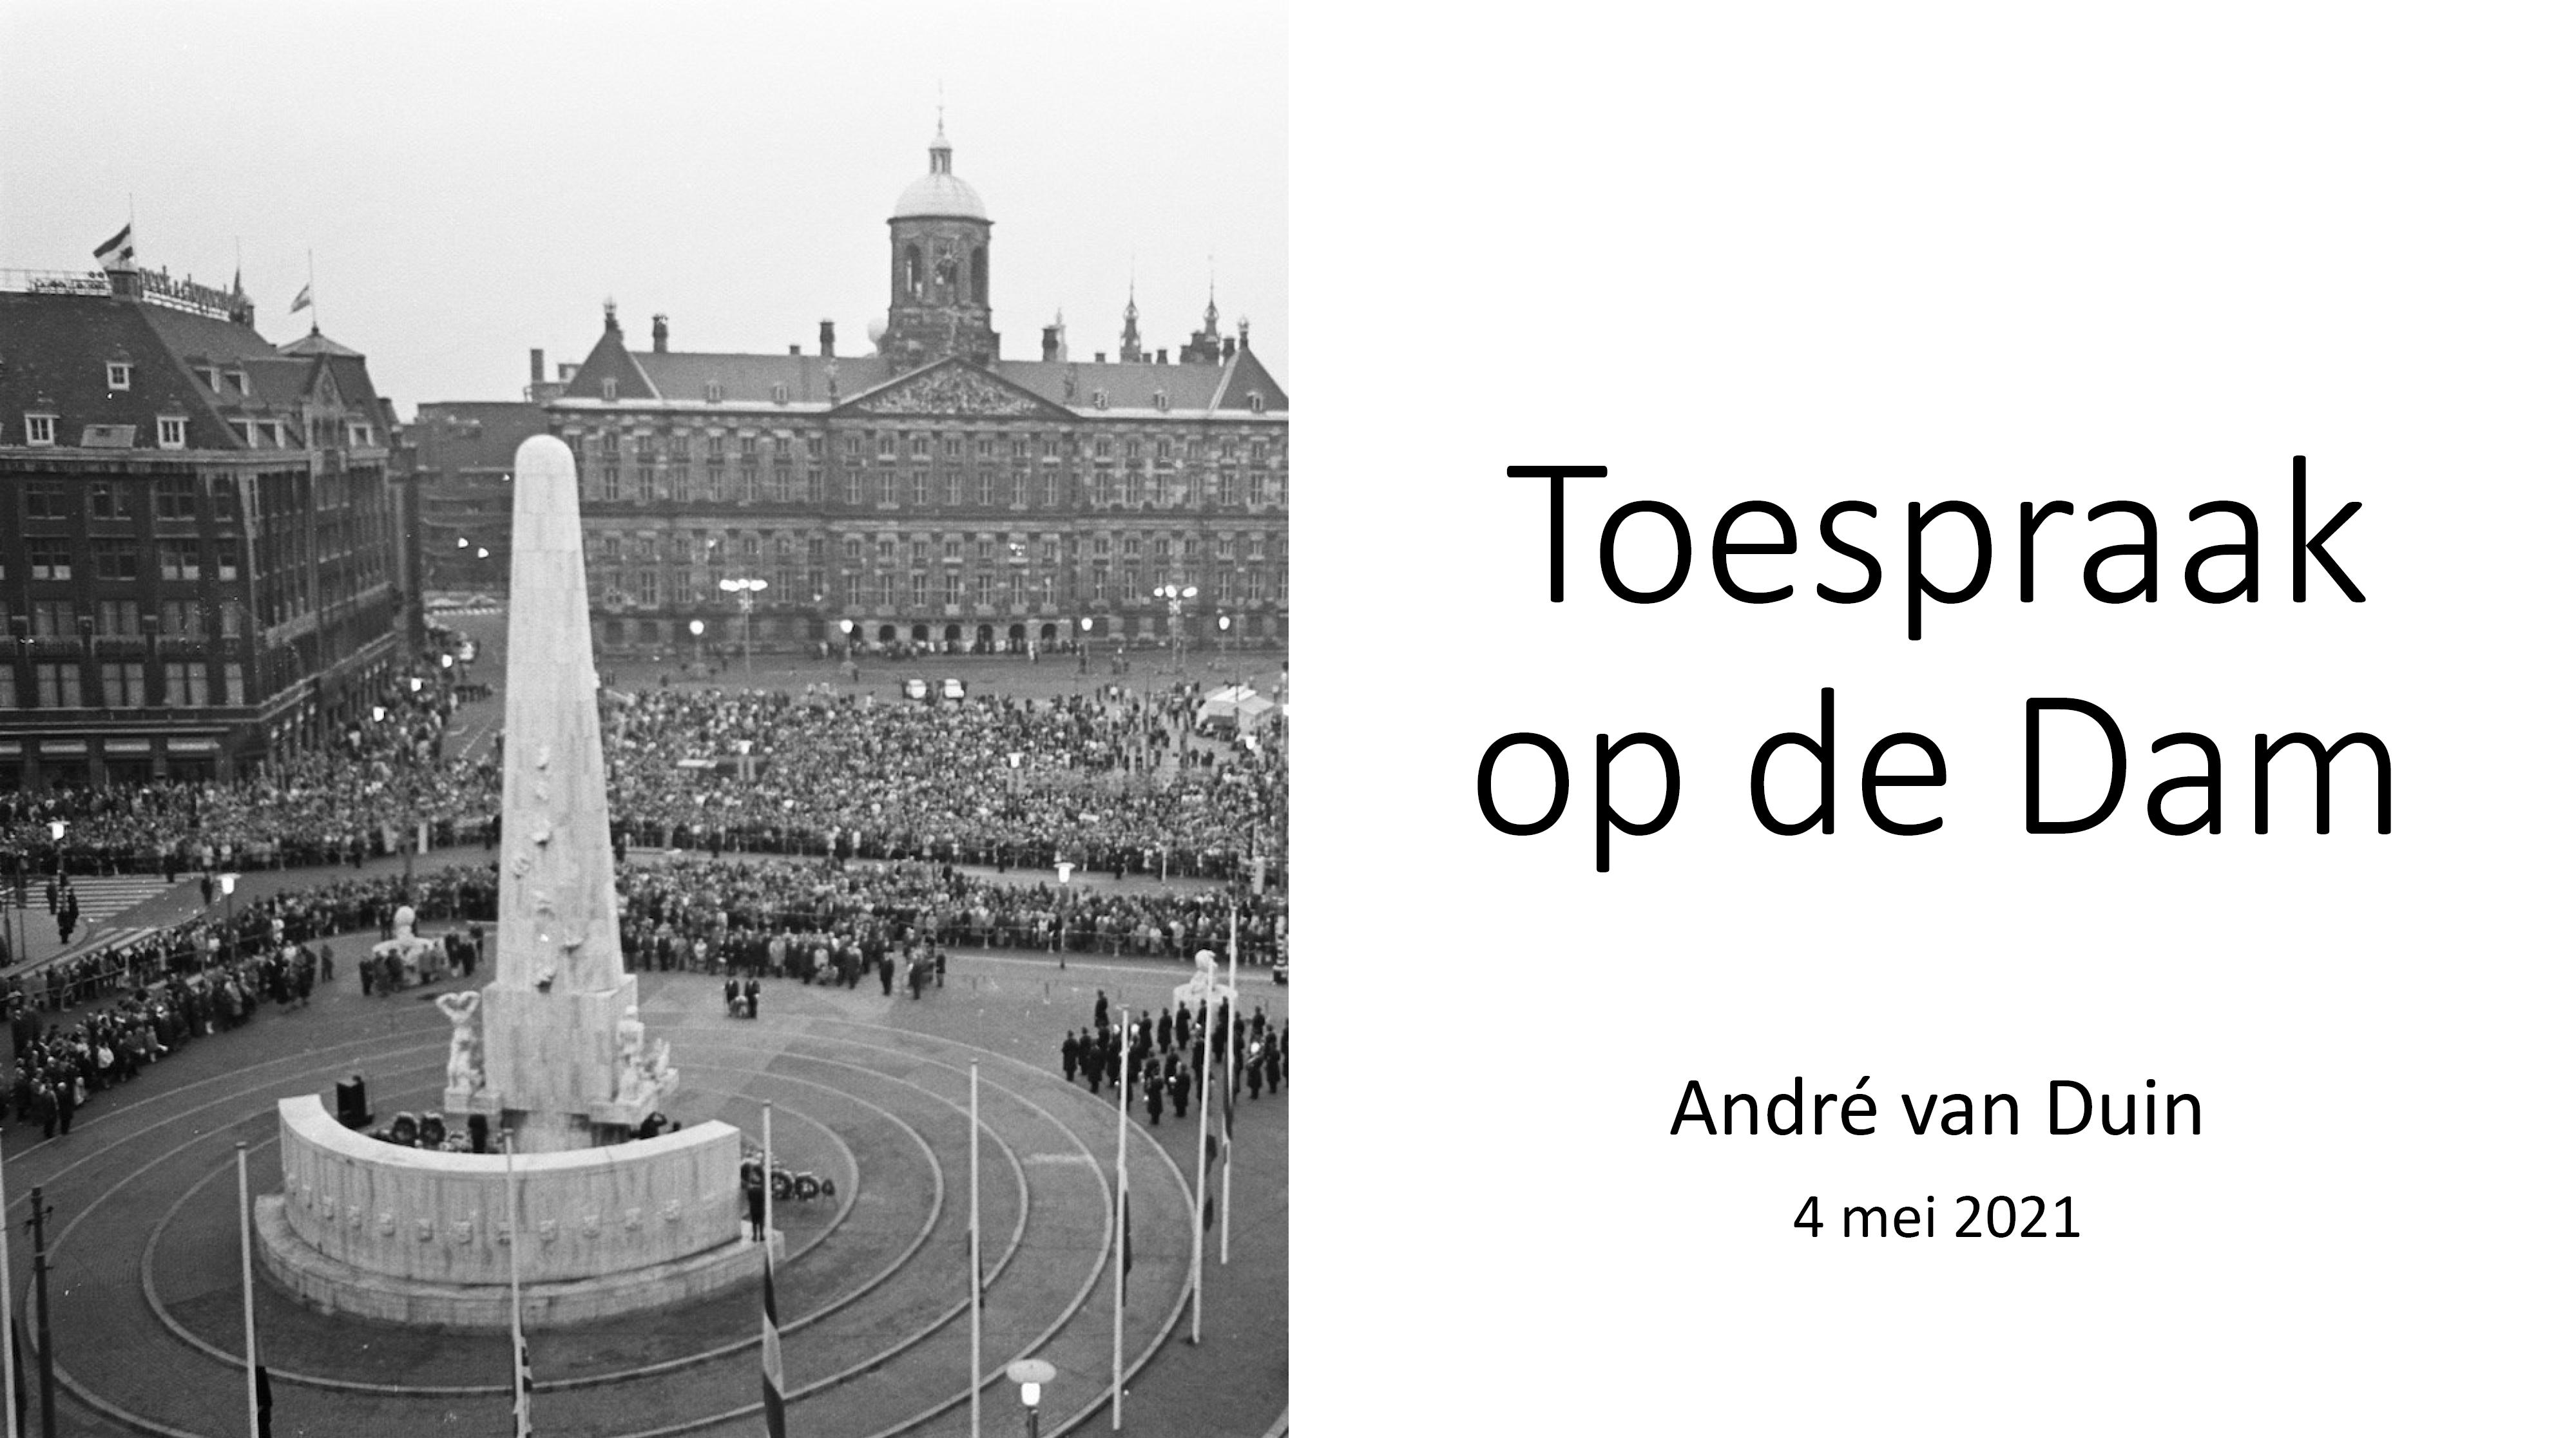 Speech André van Duin 4 mei